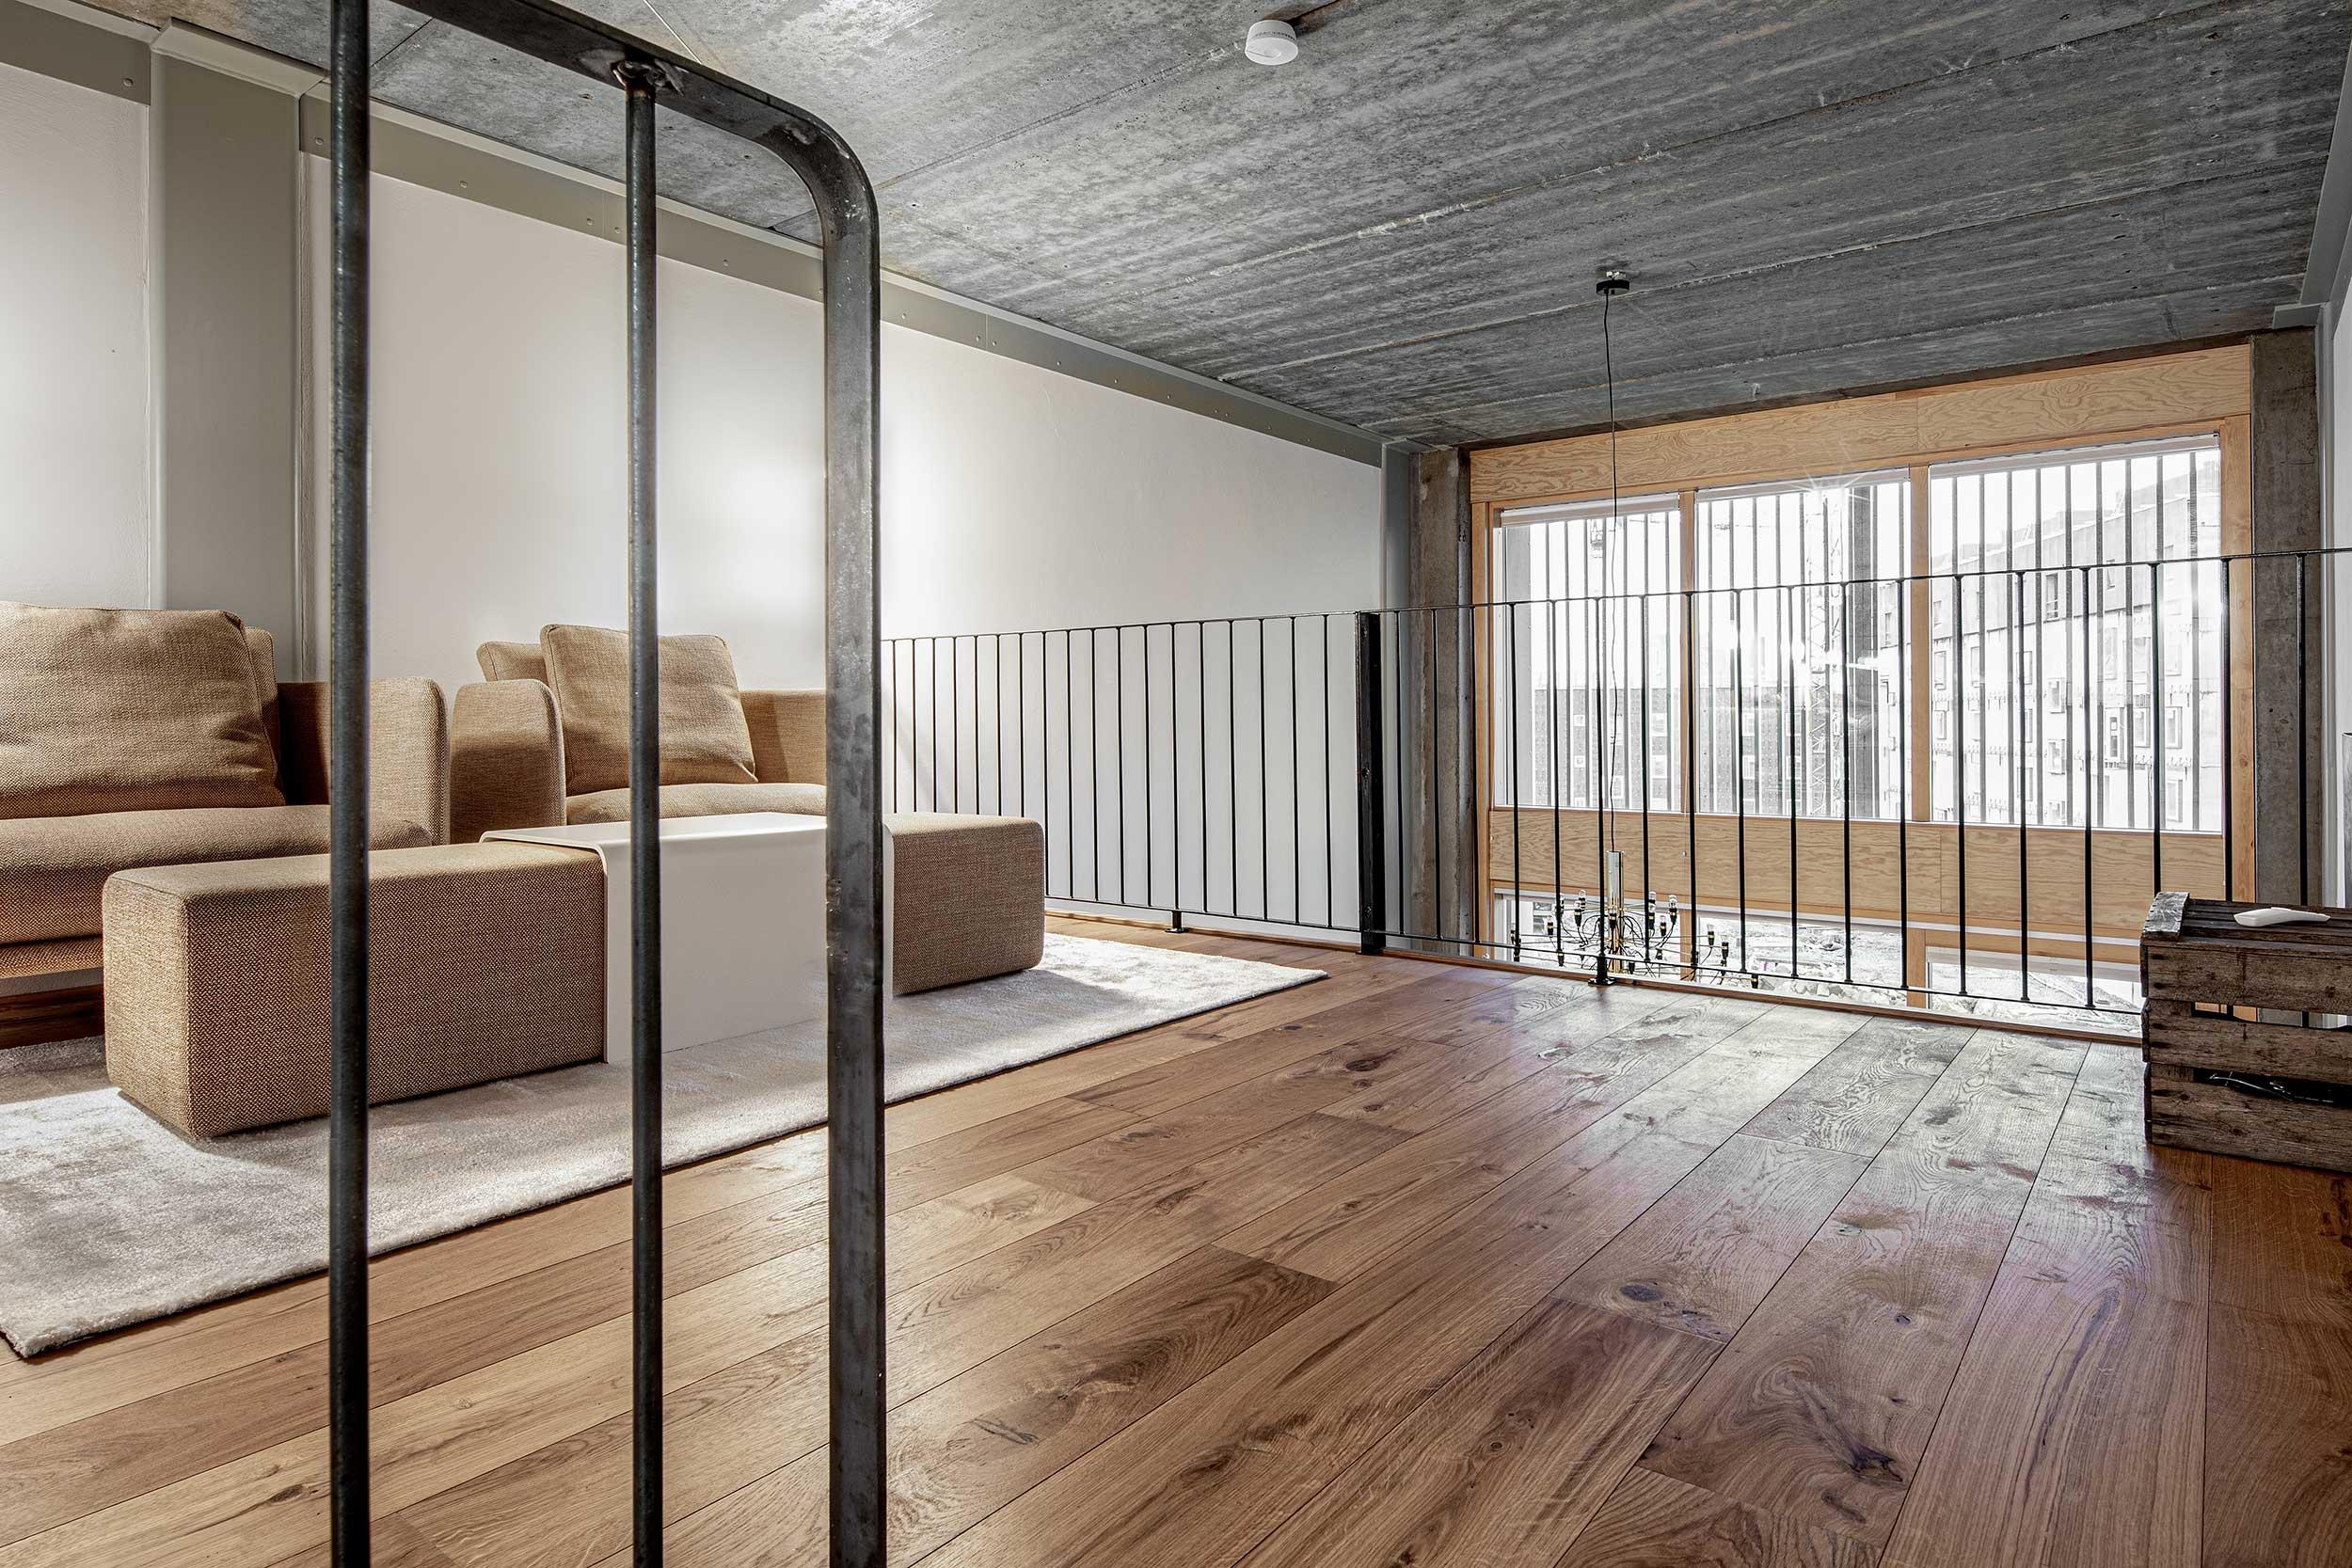 moderni asuntokuvaaja espoo helsinki betoni pinta sisustus